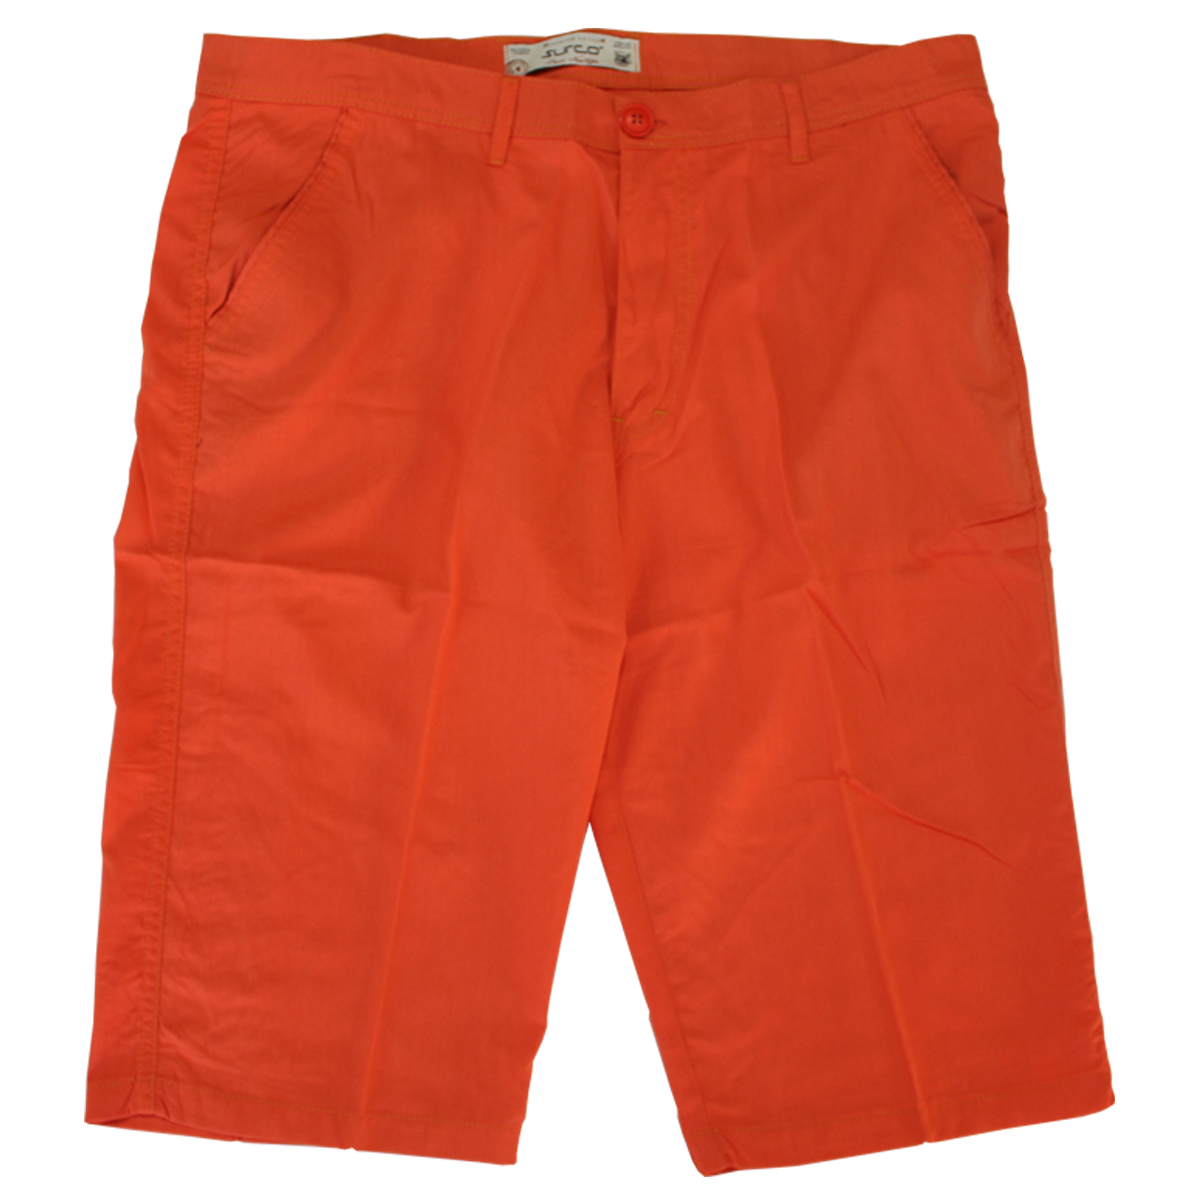 Pantalon trei sferturi portocaliu, Marime 60 - egato.ro